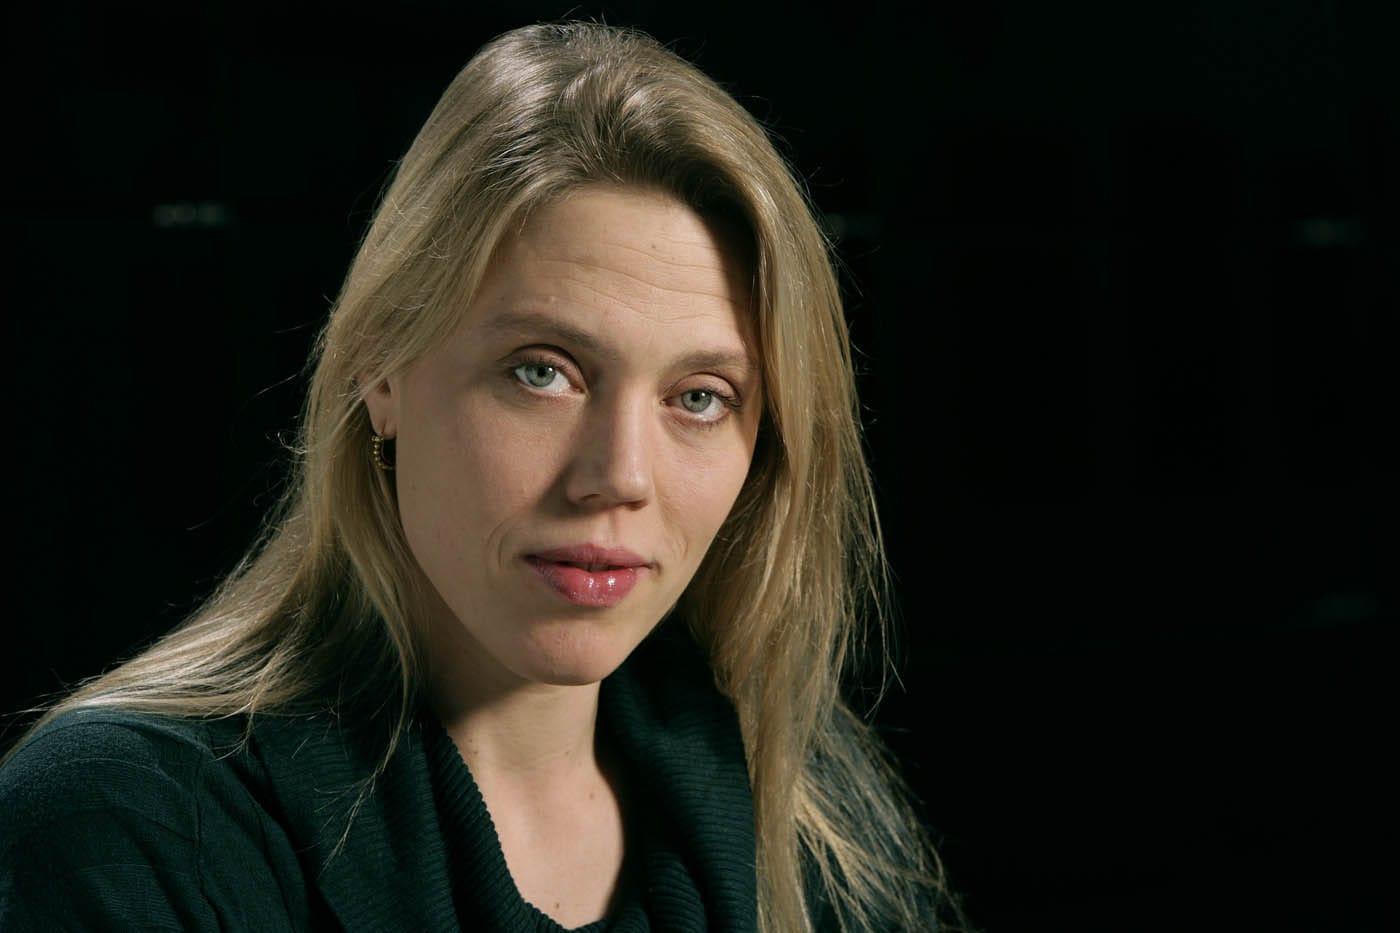 Hovedforfatter Maya Ilsøe i 2009 | © Bjarne Bergius Hermansen/DR